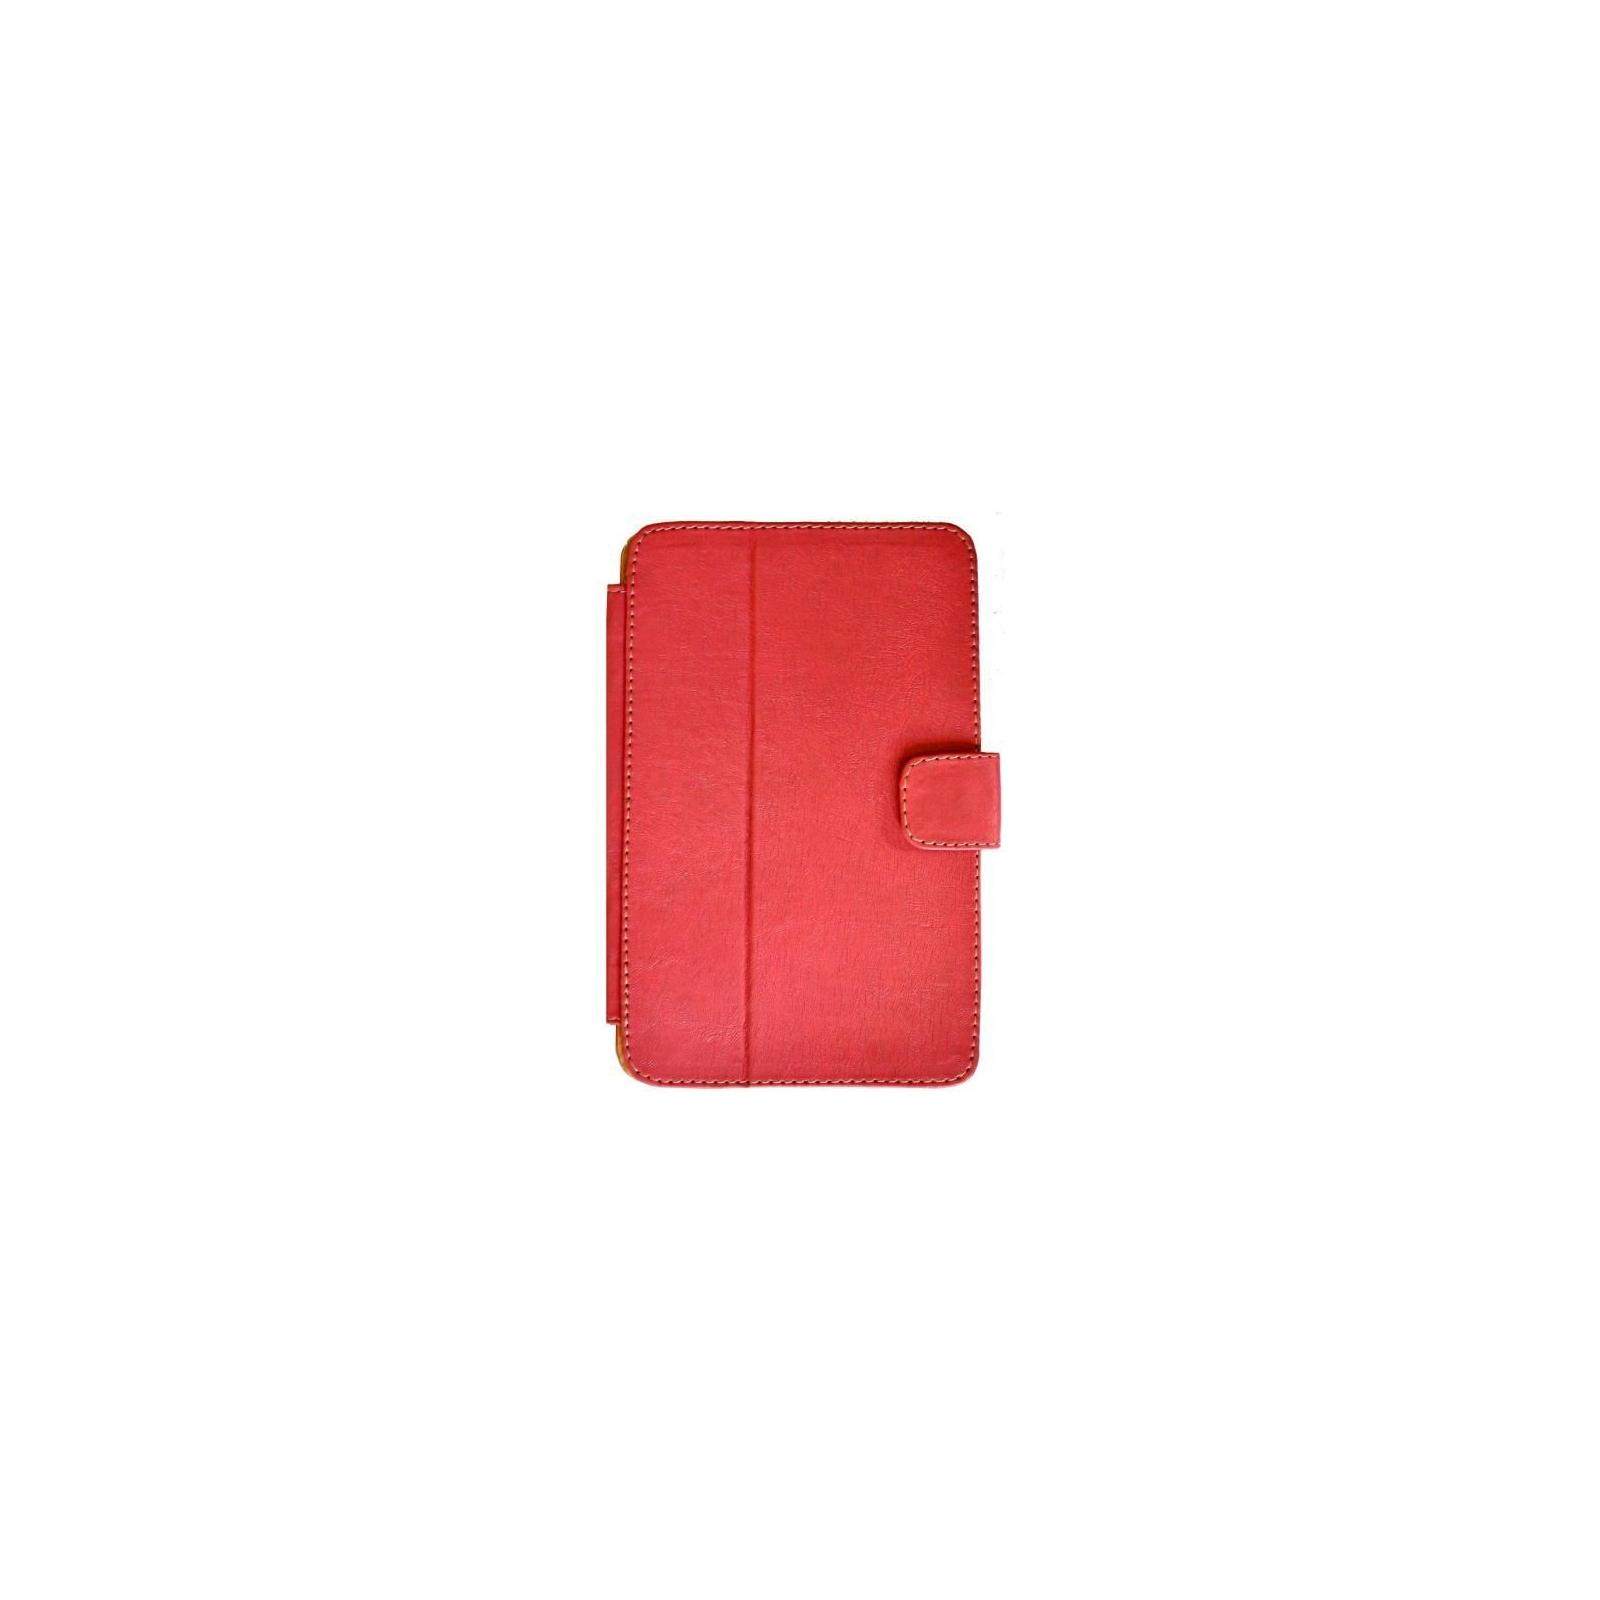 Чехол для планшета Vento 7 COOL - red